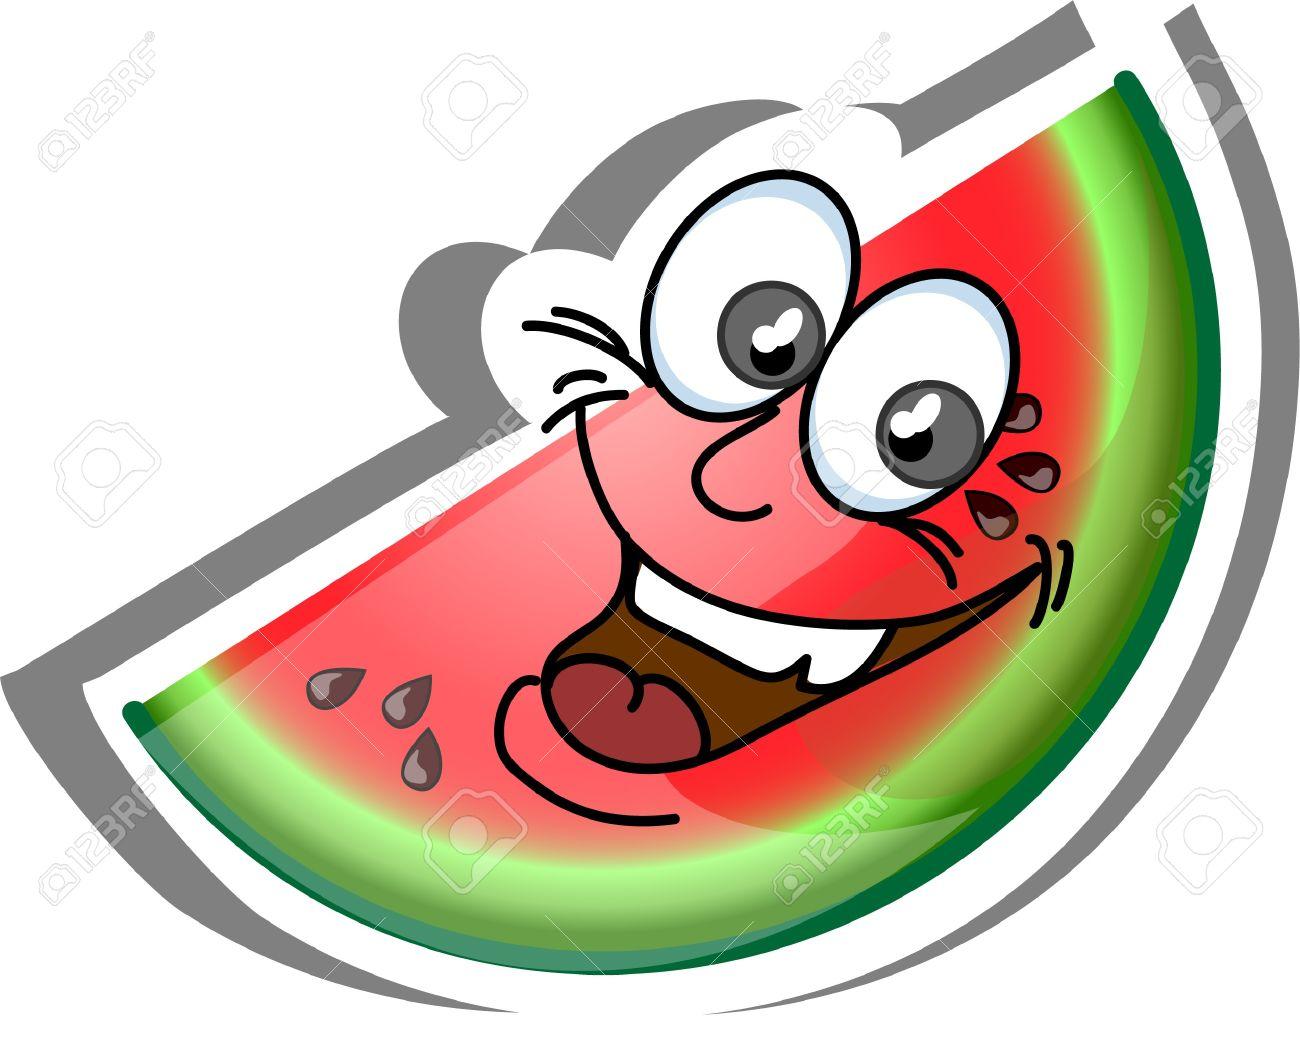 Watermelon Cartoon Images Cartoon watermelon  fruit